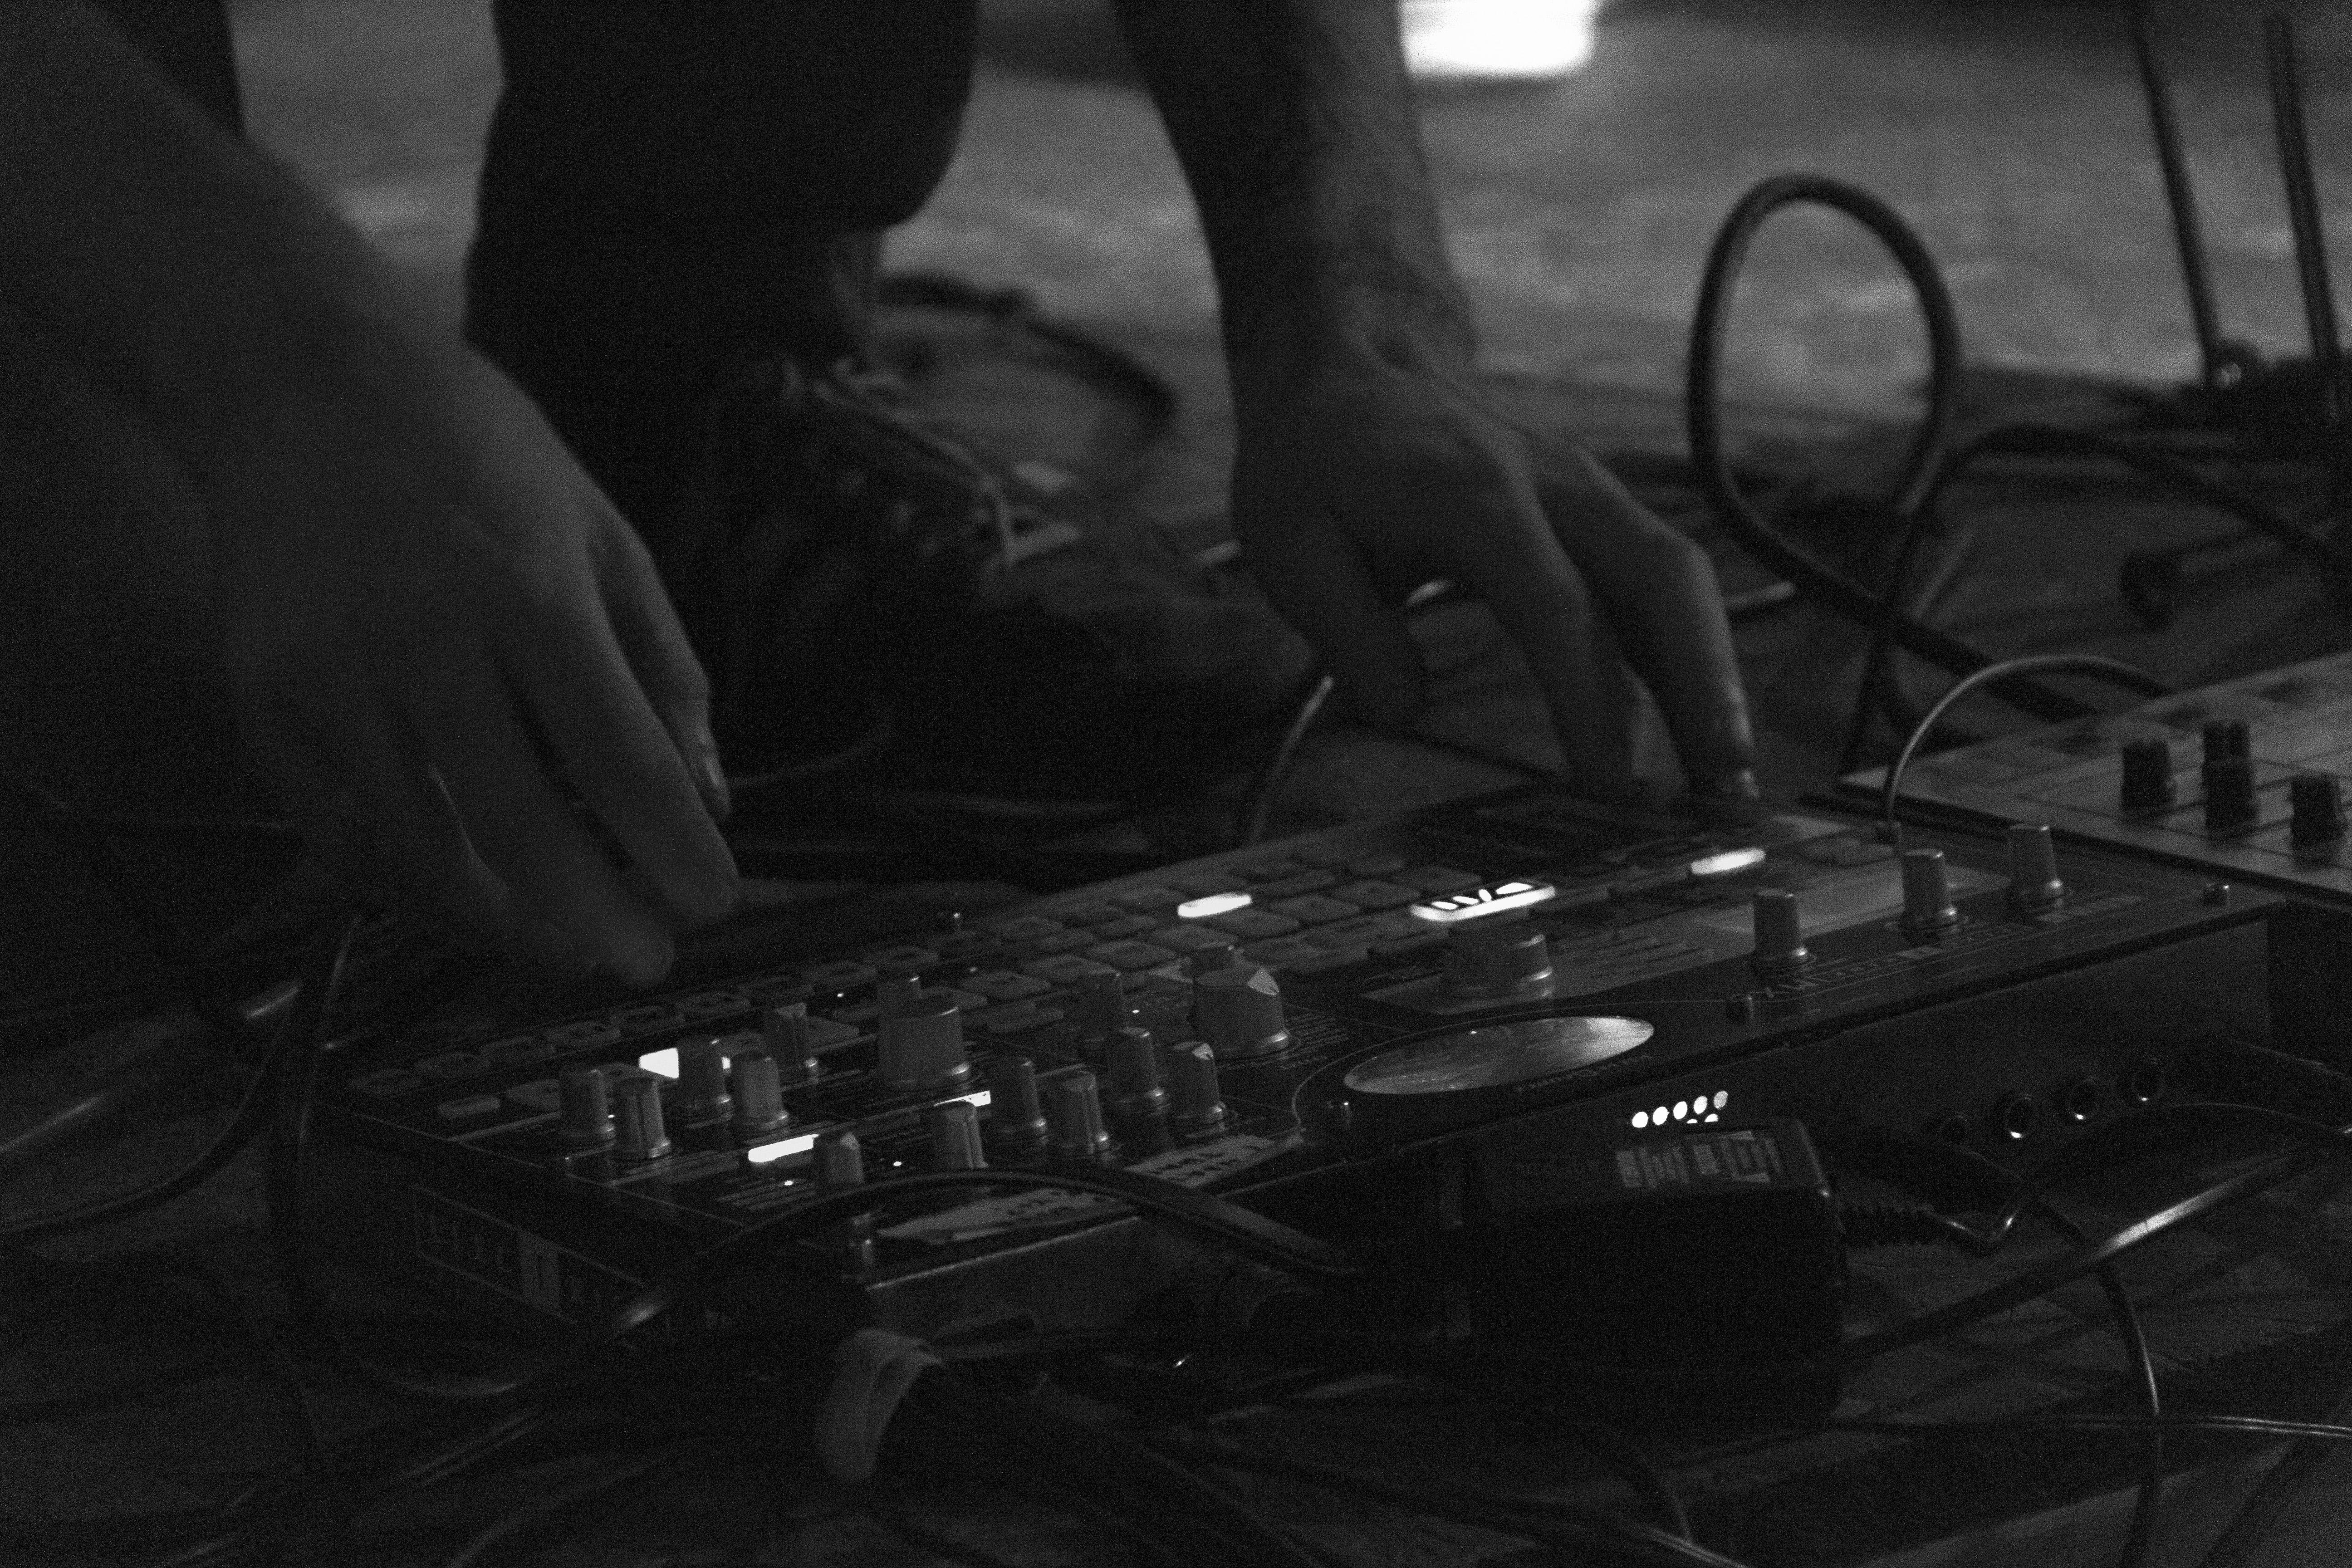 beat maker